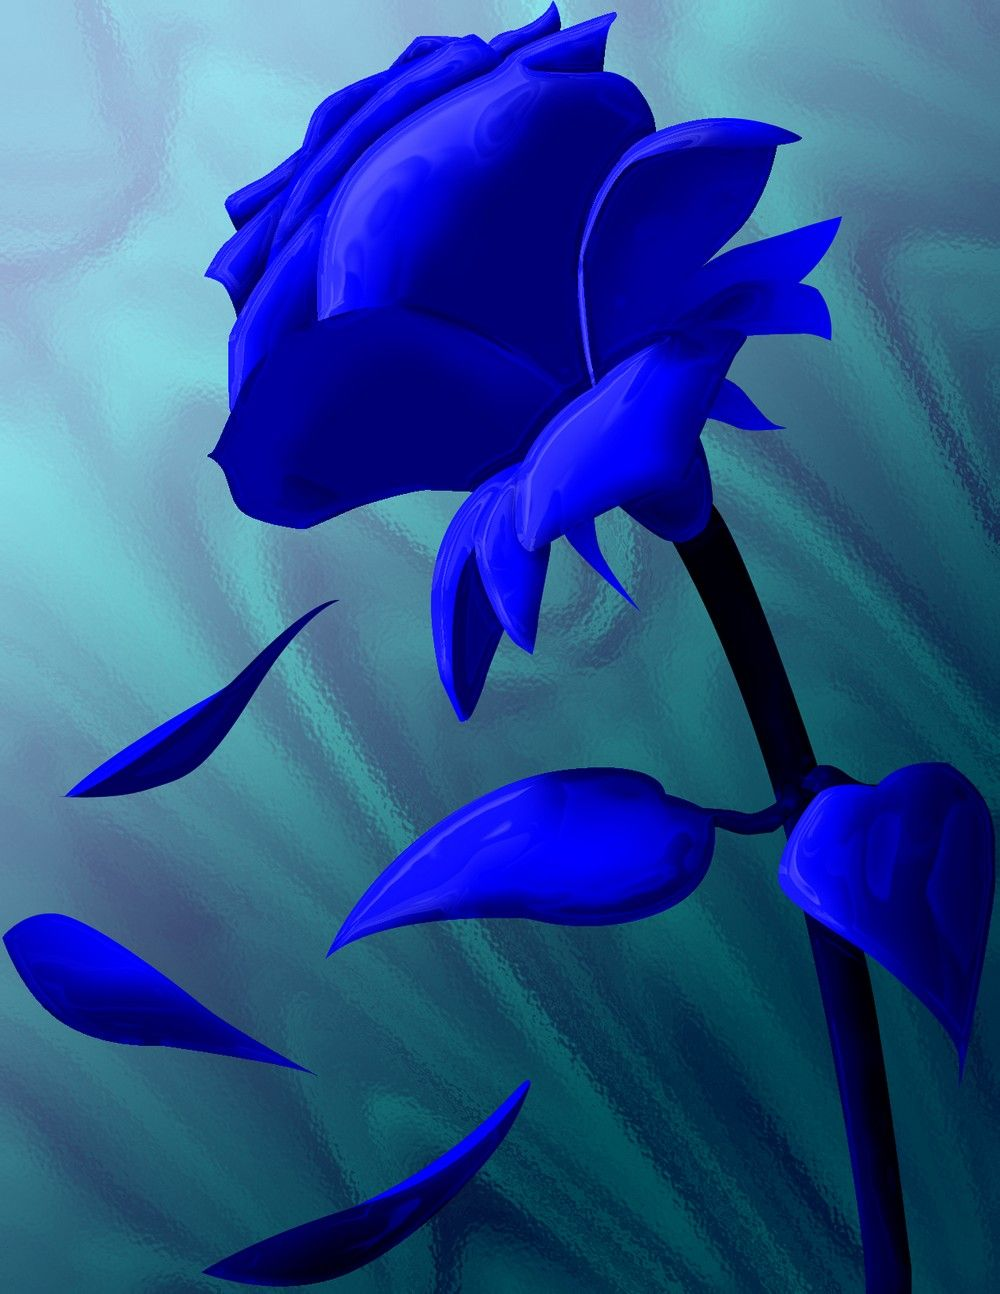 Mavi Guller Mavi Kokar Gul Resimleri Mavi Gul Resimleri Mis Kokulu Guller Cicekler Ozel Gunler Icin Gul Resimleri Blue Roses Wallpaper Blue Roses Blue Rose